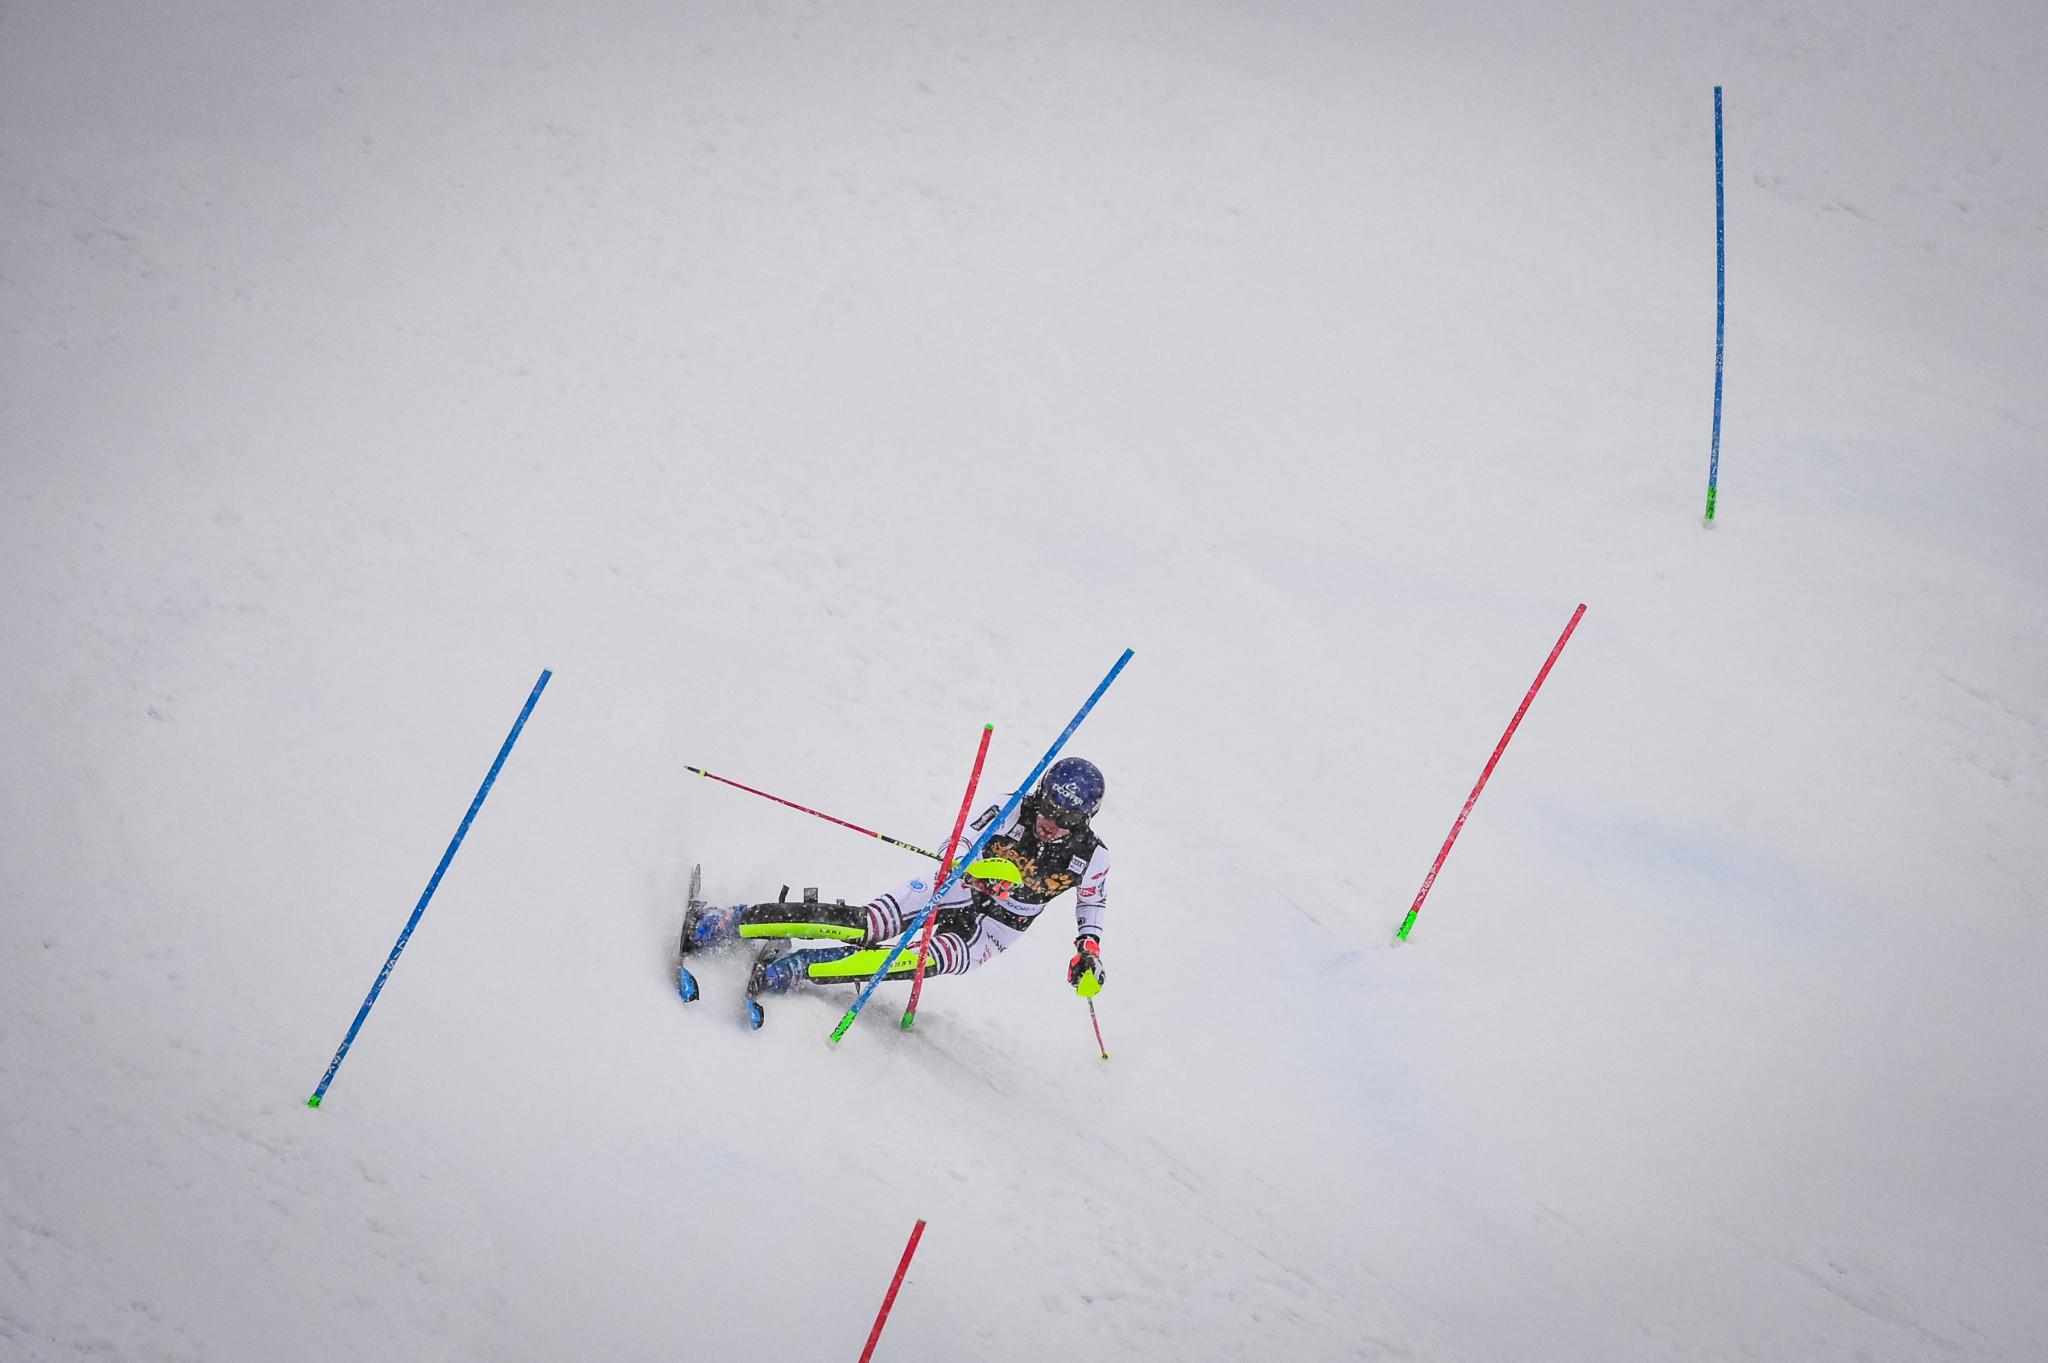 Noël triumphs in men's slalom at FIS Alpine Ski World Cup in Kranjska Gora